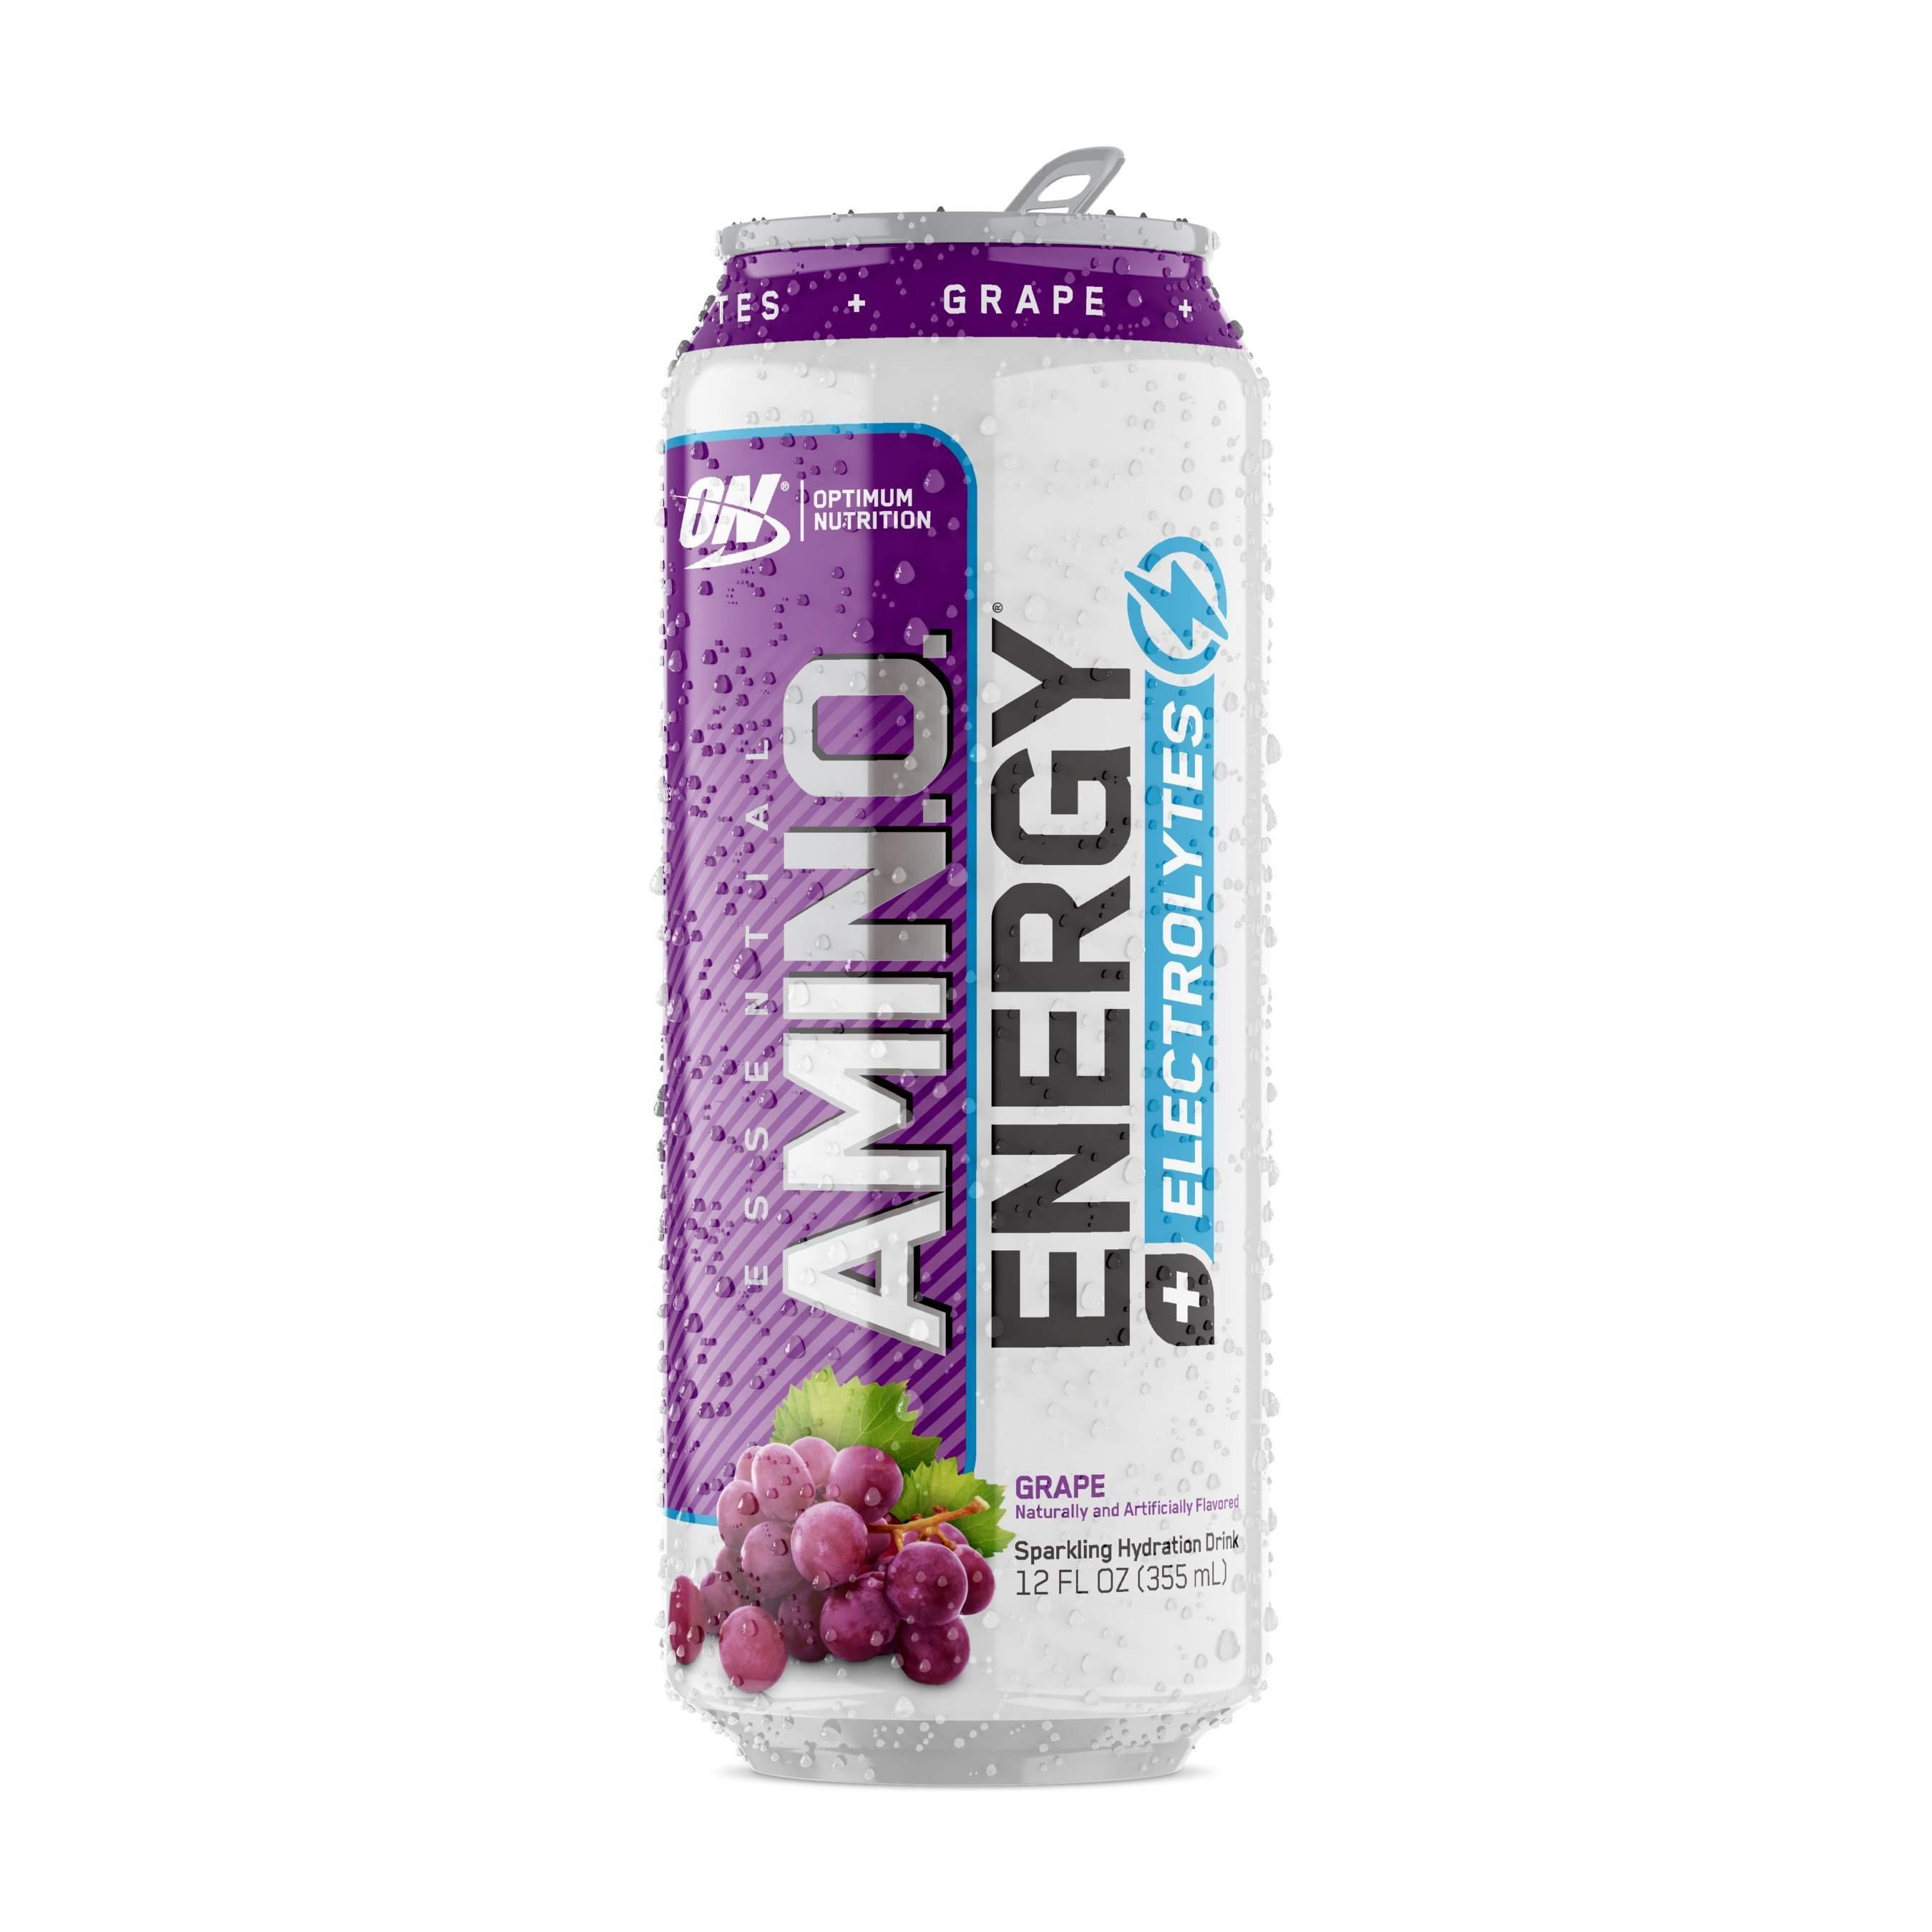 performance nutrition beverage